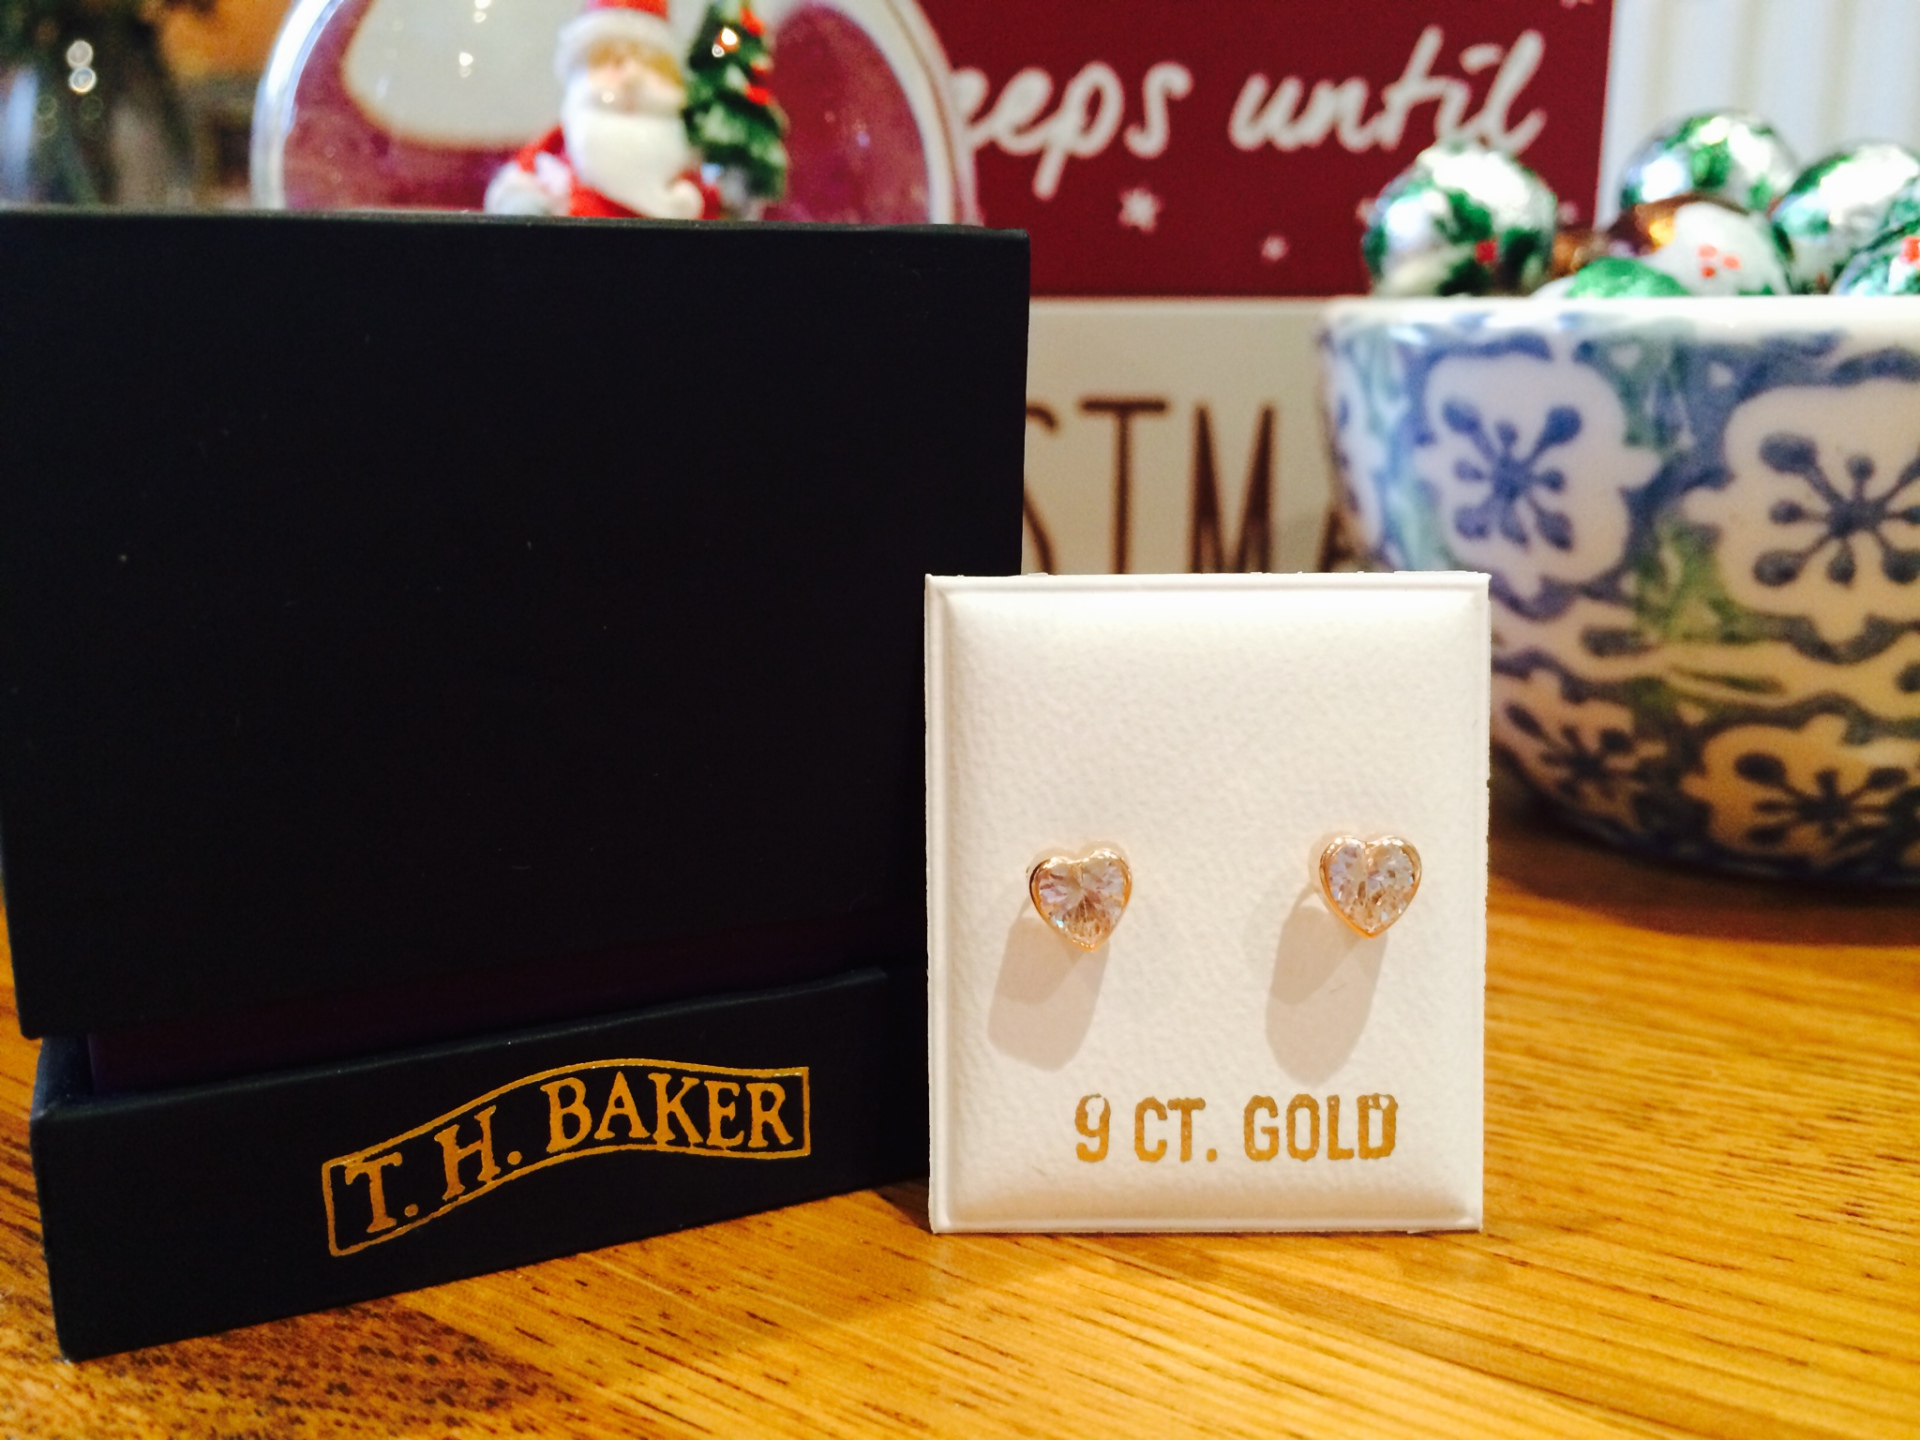 T.H. Baker 9 Carat Gold Earrings